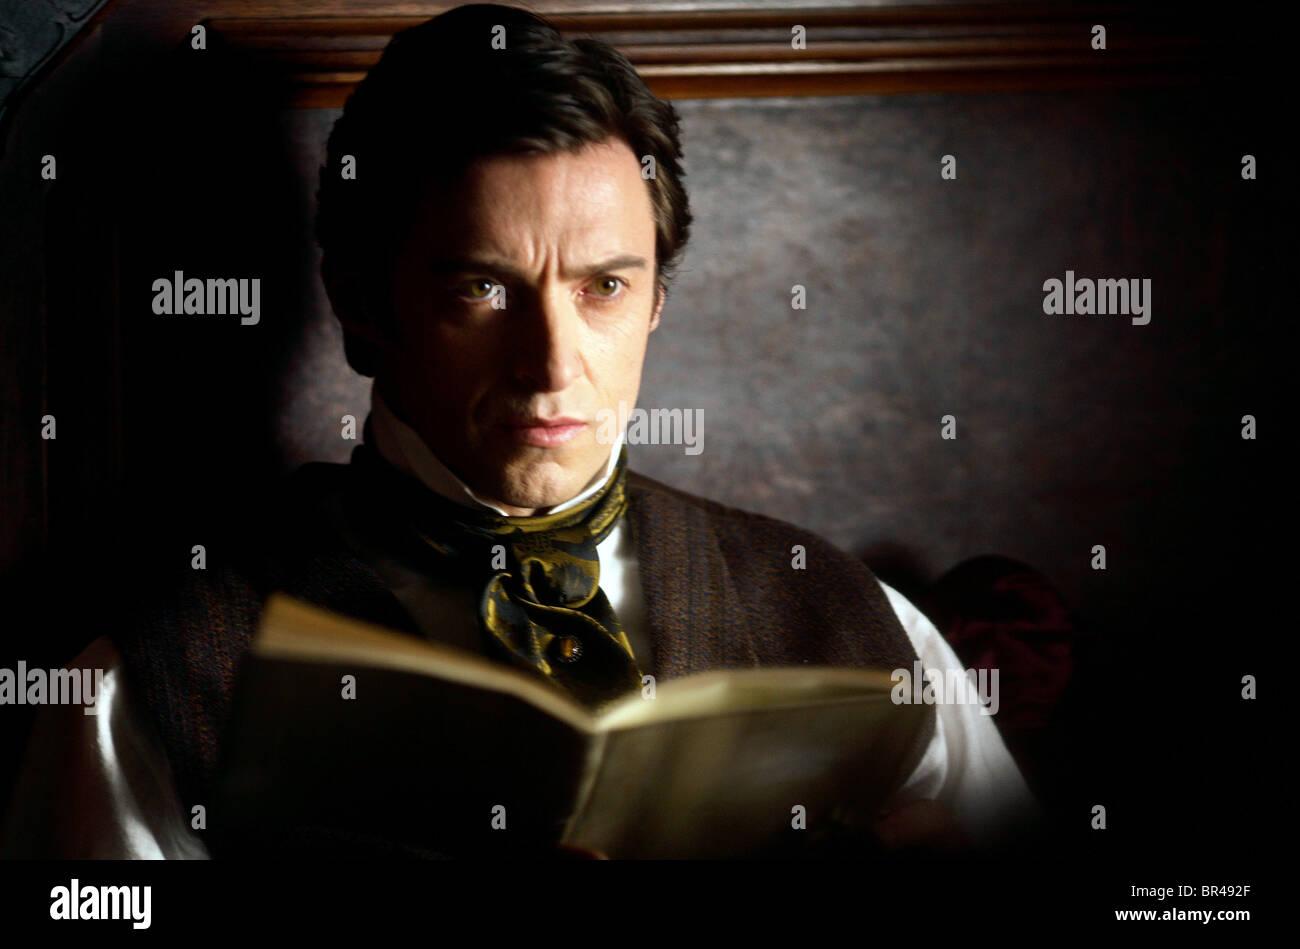 HUGH JACKMAN THE PRESTIGE (2006) - Stock Image